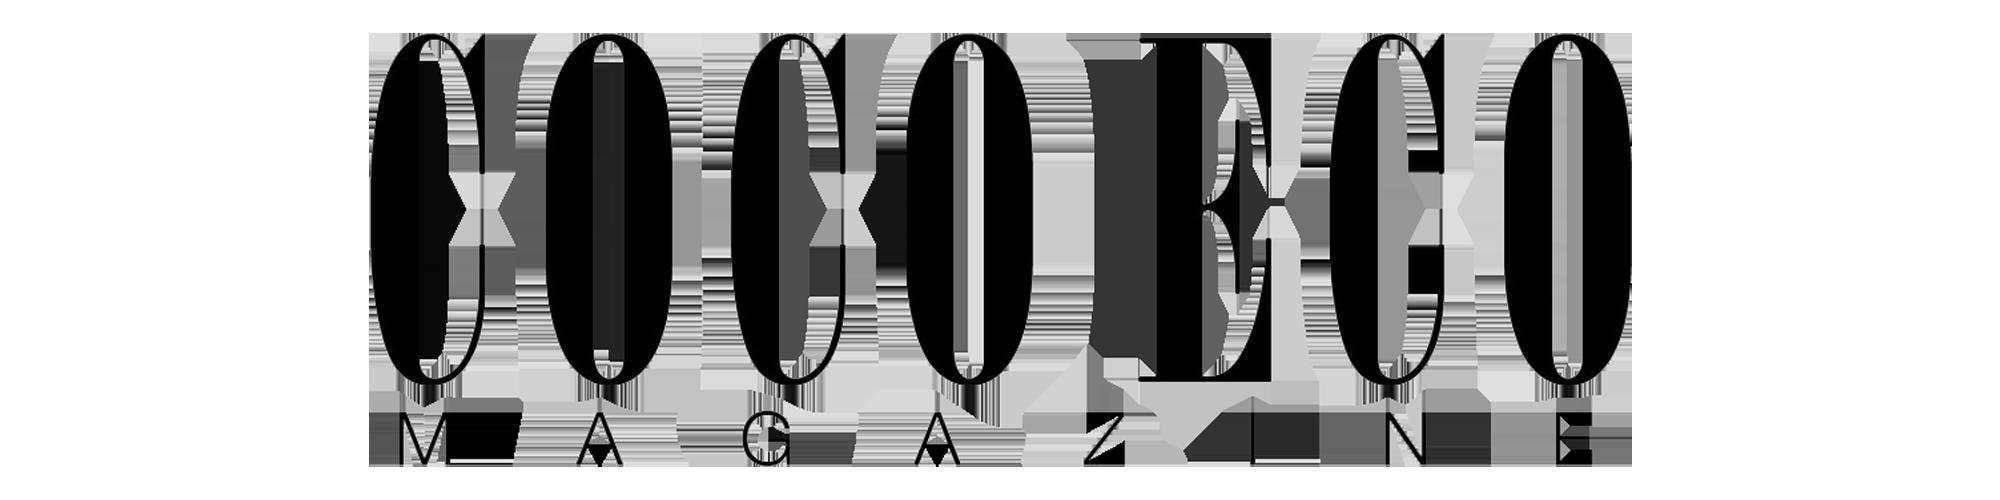 cocoeco-logo.png